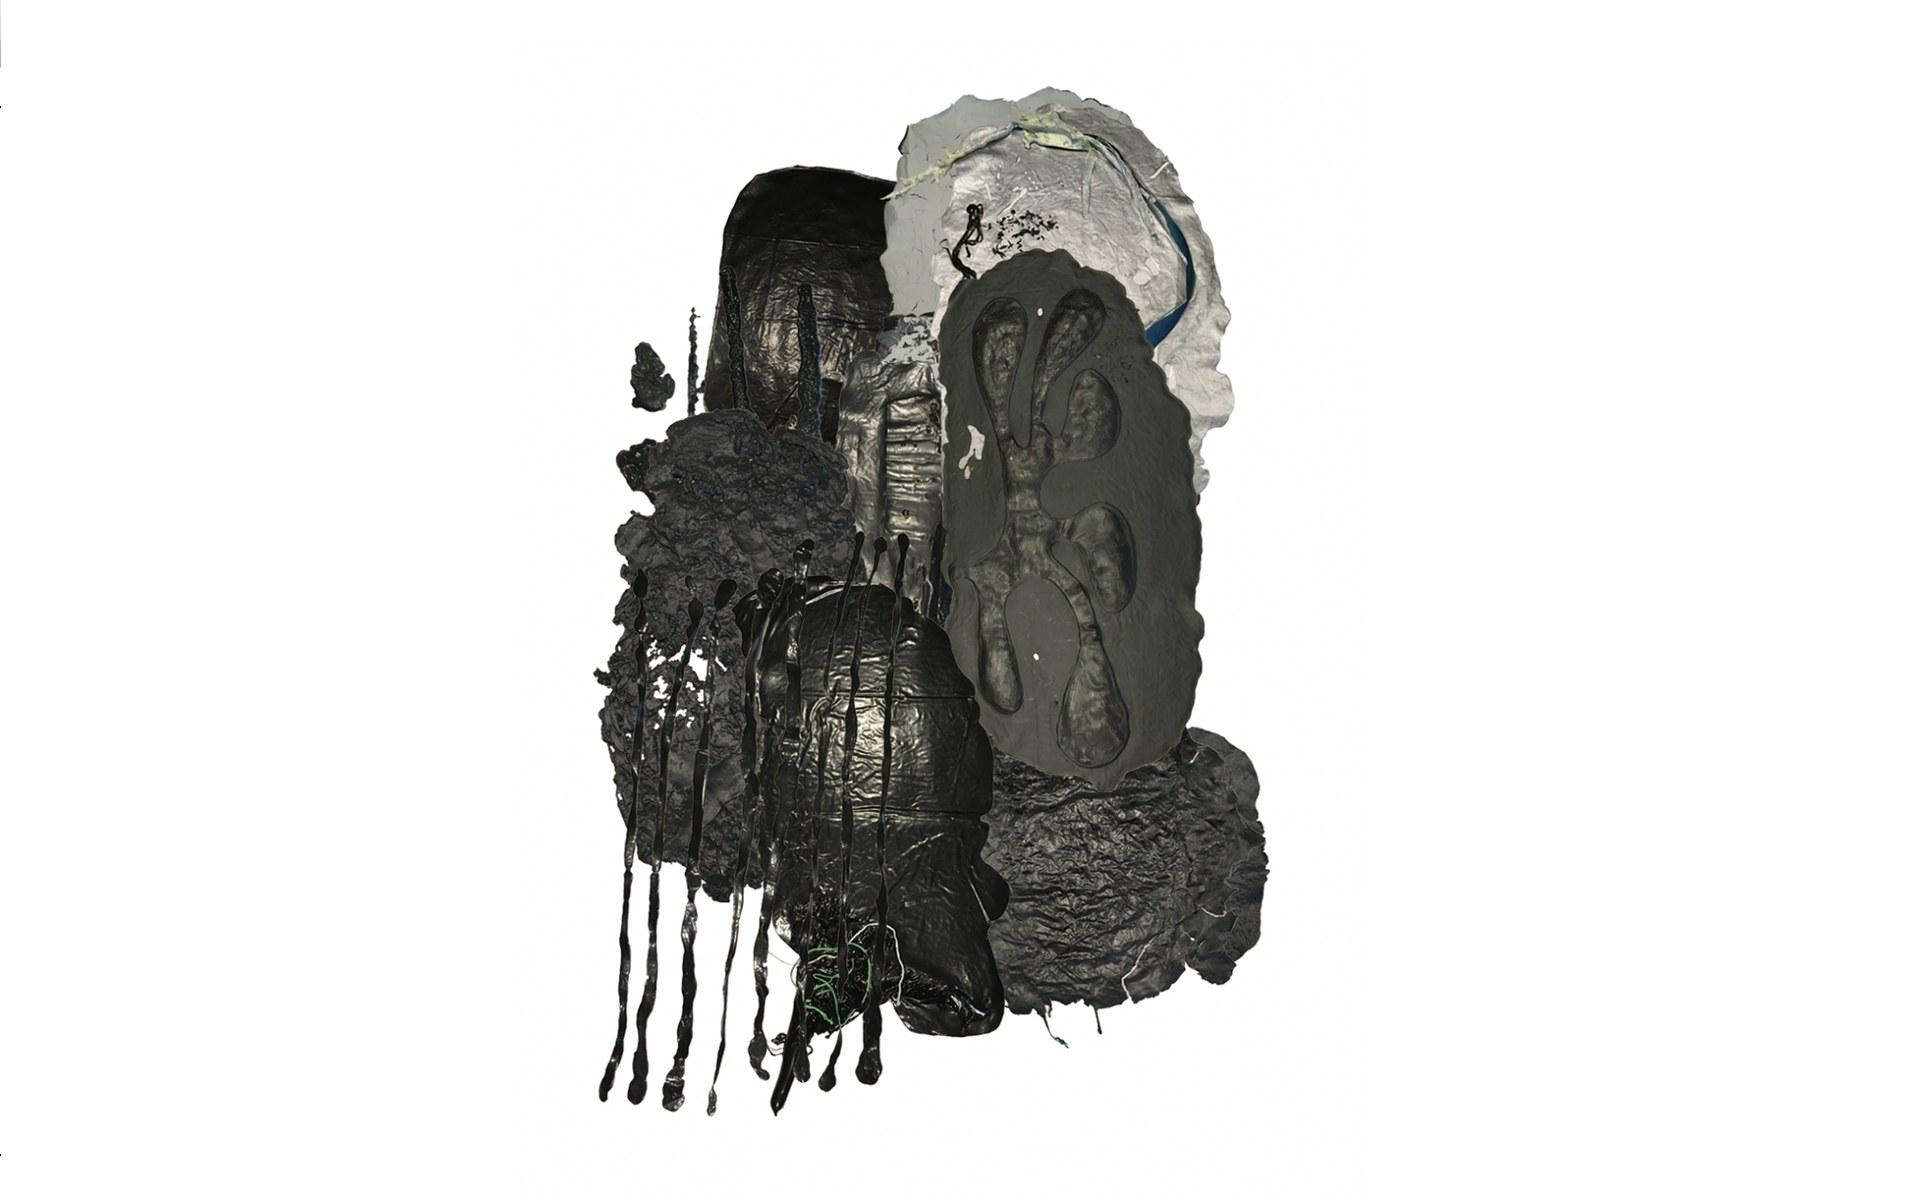 Weeping Wall series (Quien los mató? / Who killed them?)